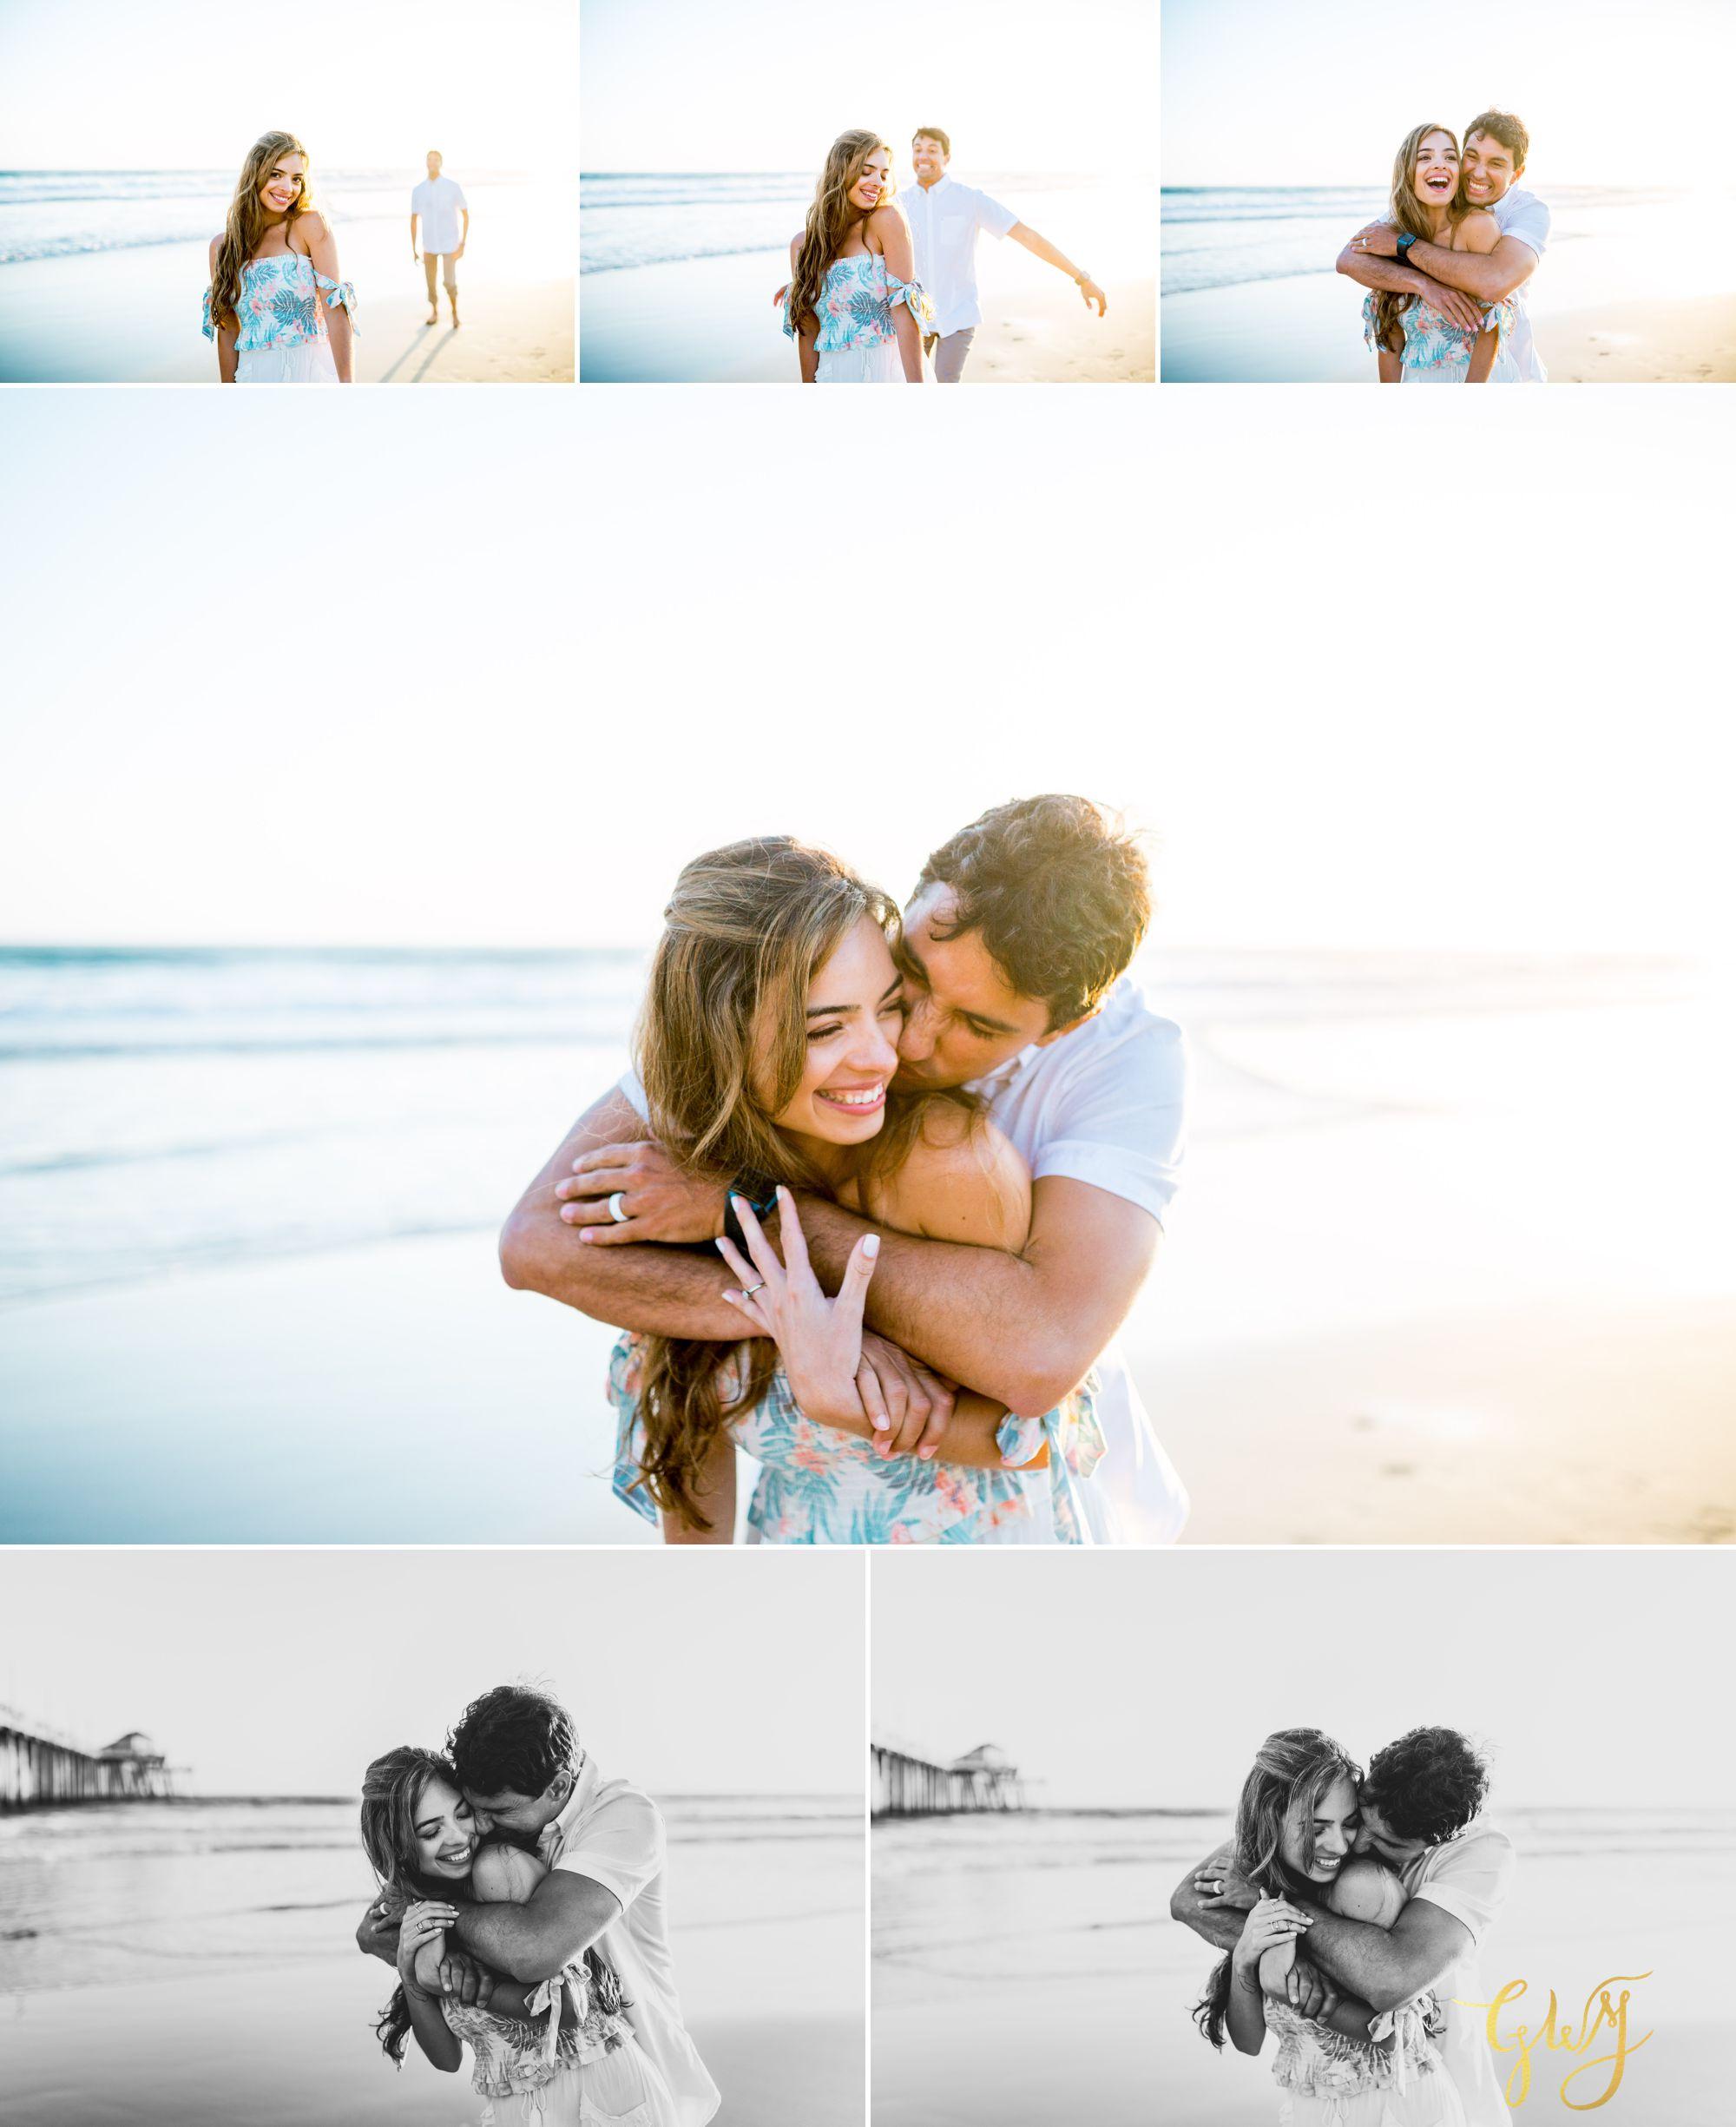 Felipe + Isabella Huntington Beach Summer Sunset Engagement Session by Glass Woods Media 23.jpg